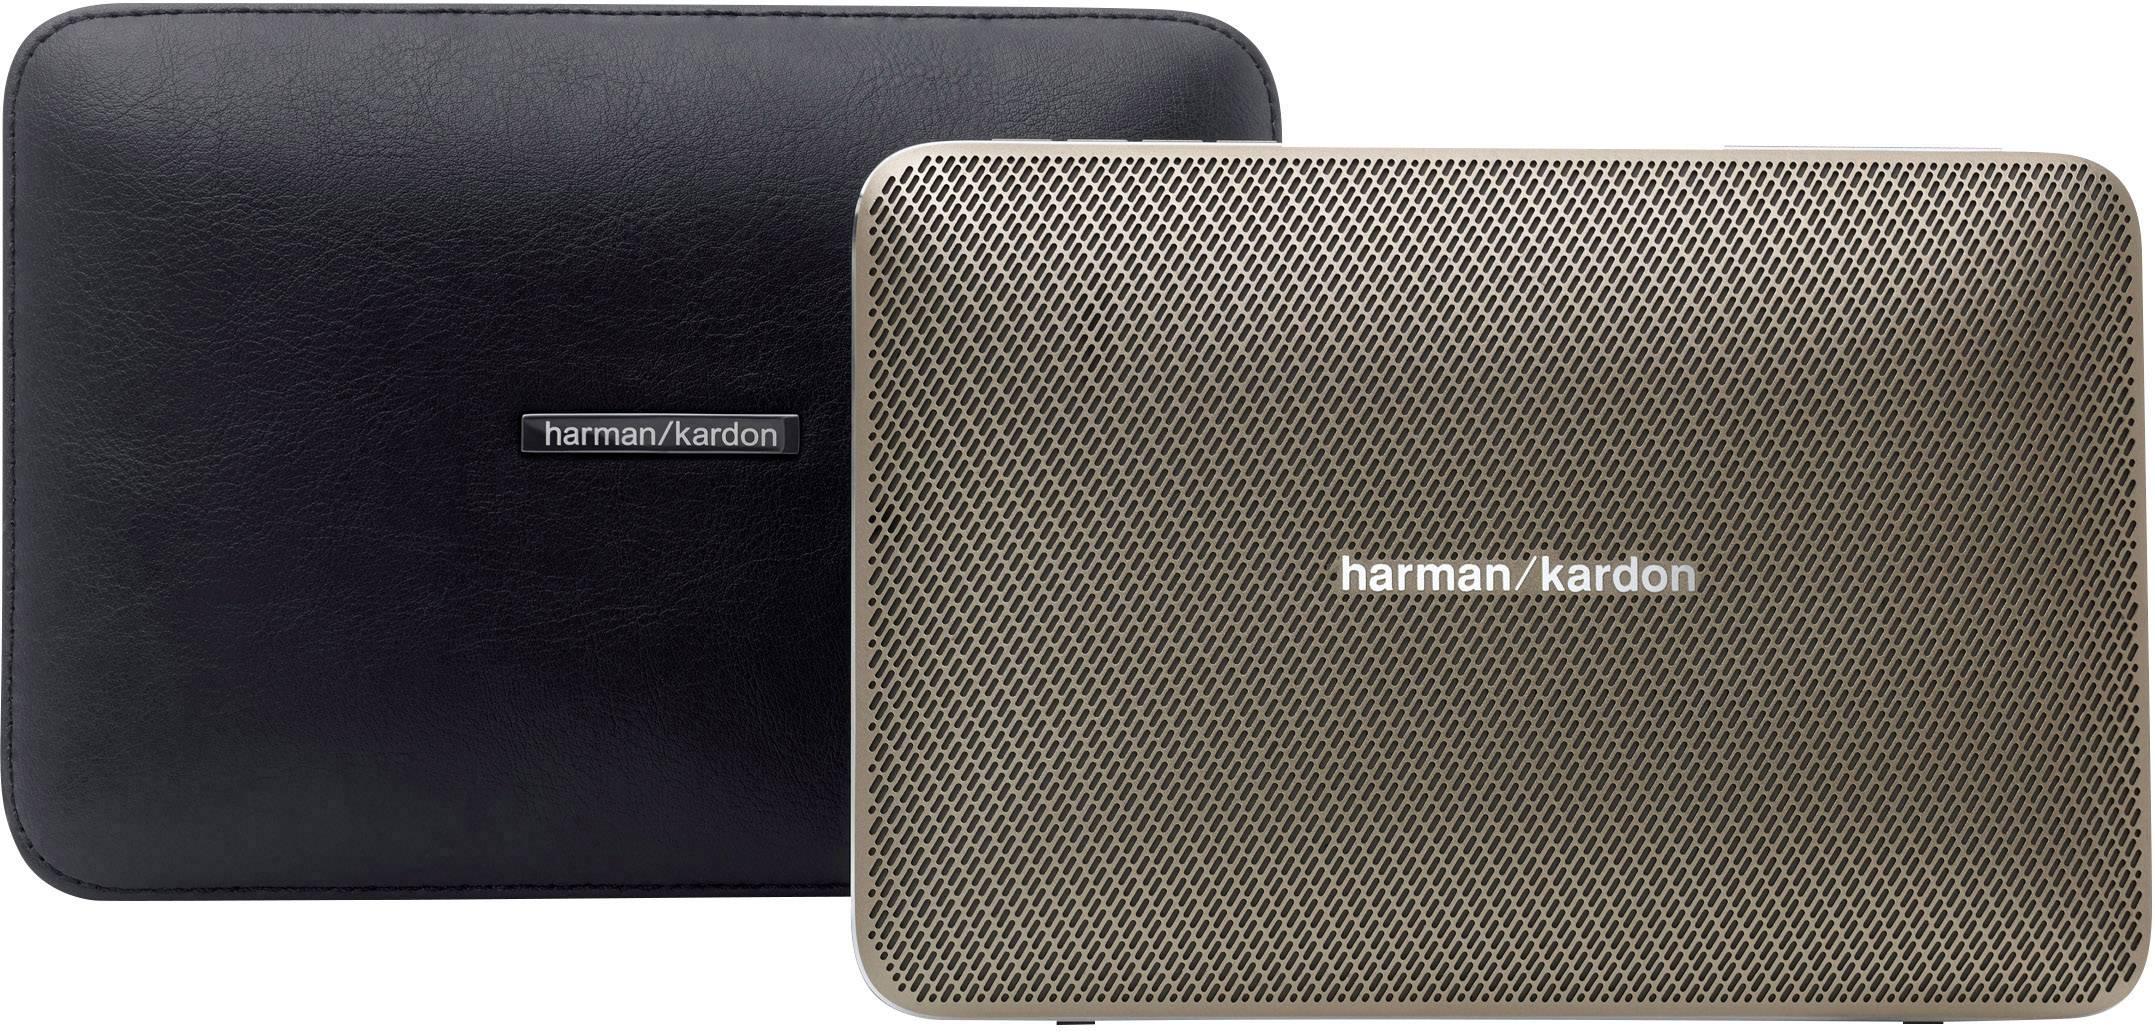 8ba45217e19 Harman Kardon Esquire 2 Case draagtasje, Zwart | Conrad.be